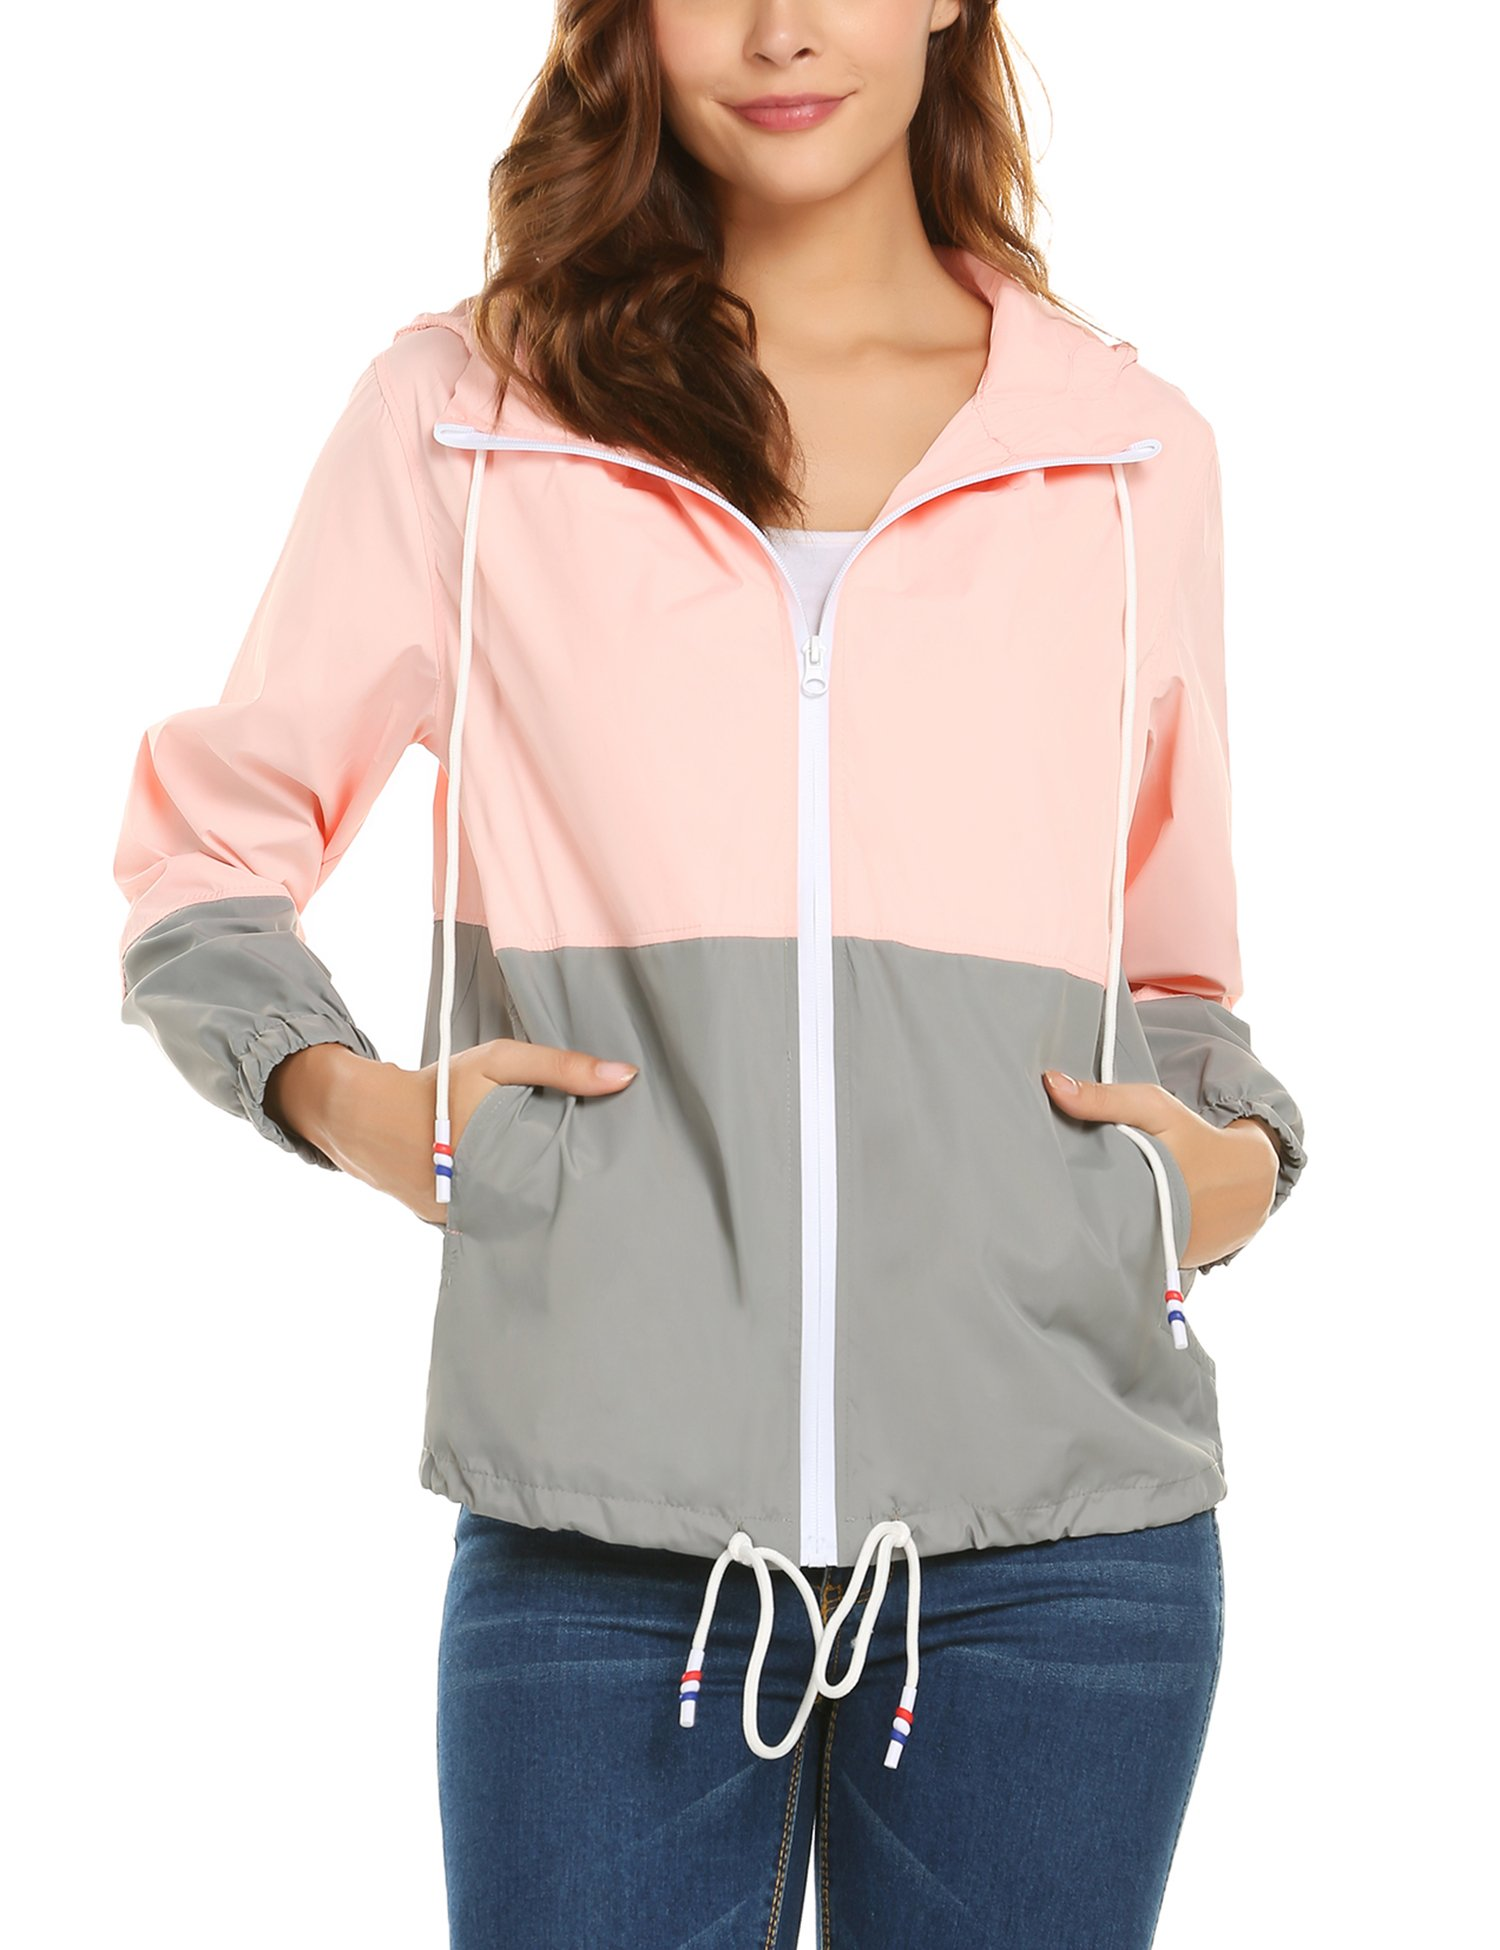 ZHENWEI Women's Lightweight Raincoat Zip up Casual Hoodie Rain Jacket Pink L by ZHENWEI (Image #3)